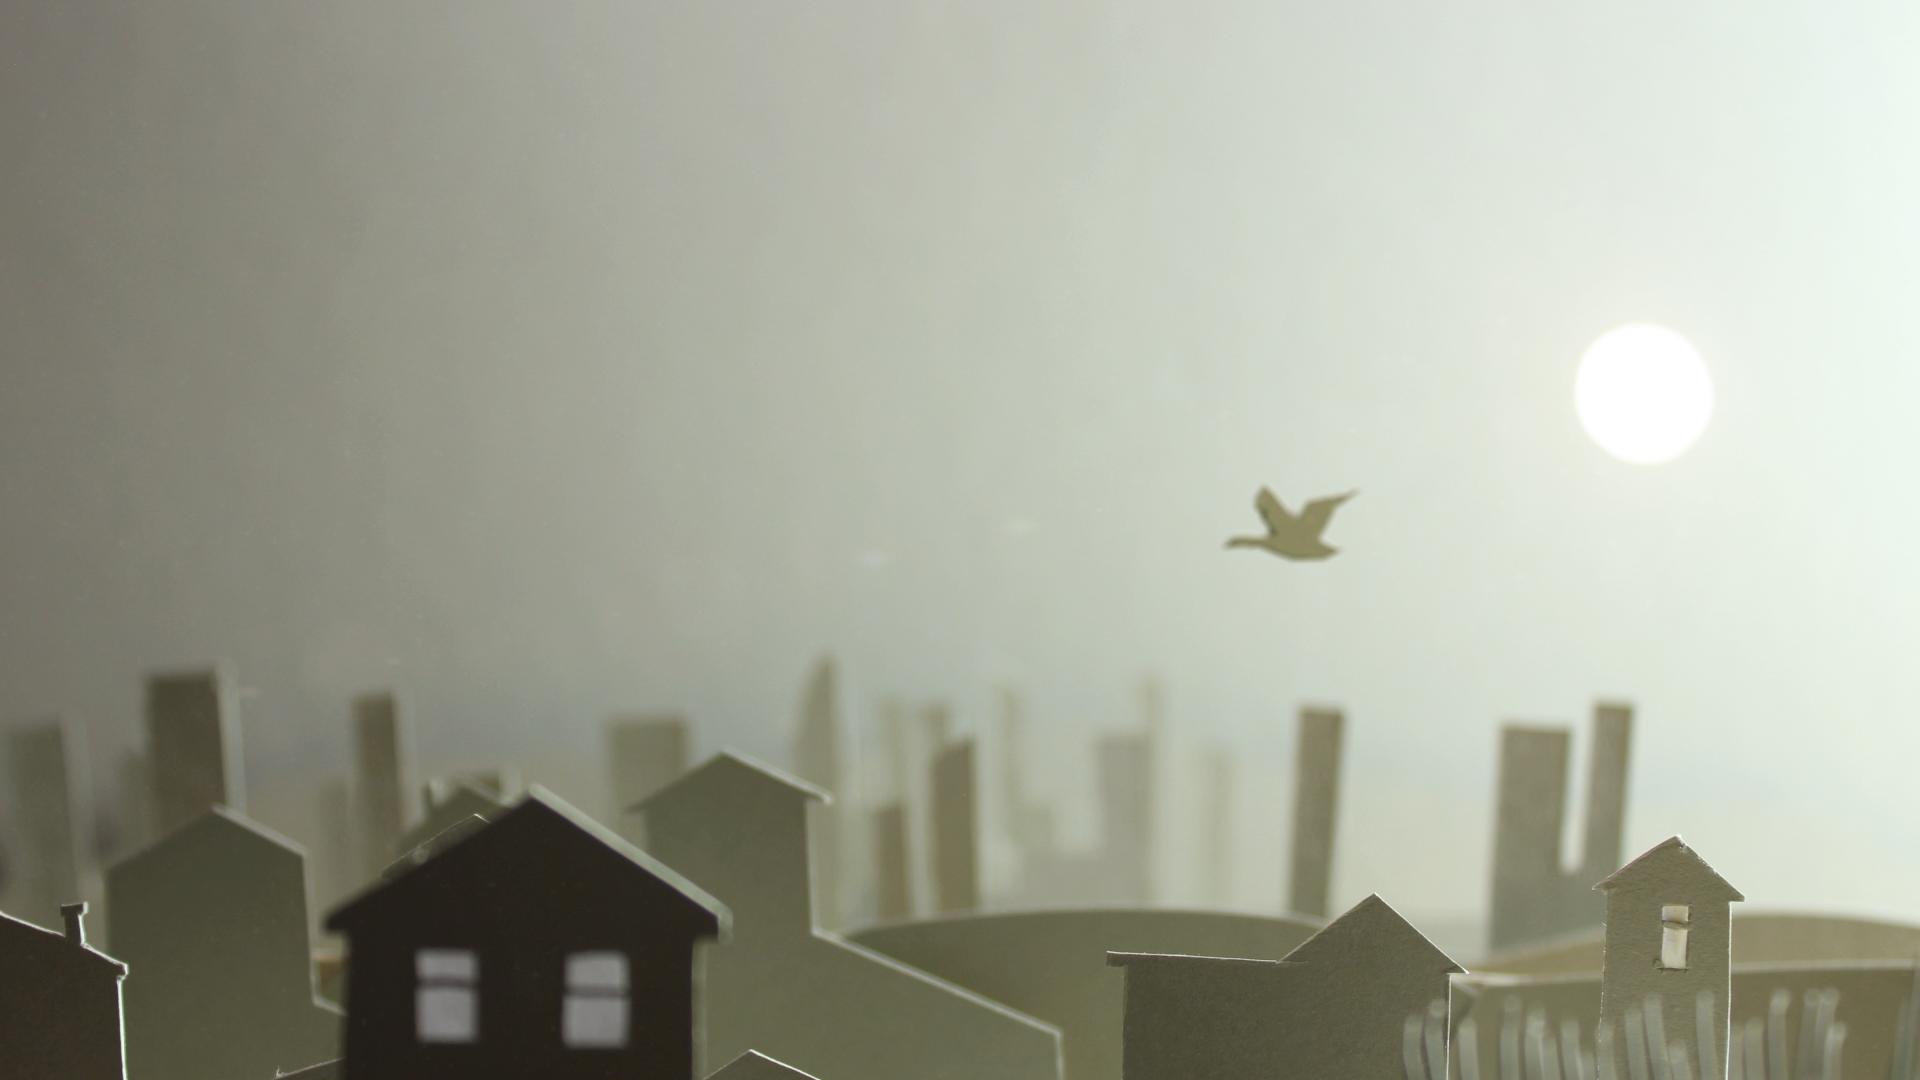 Tele-Bird-over-houses